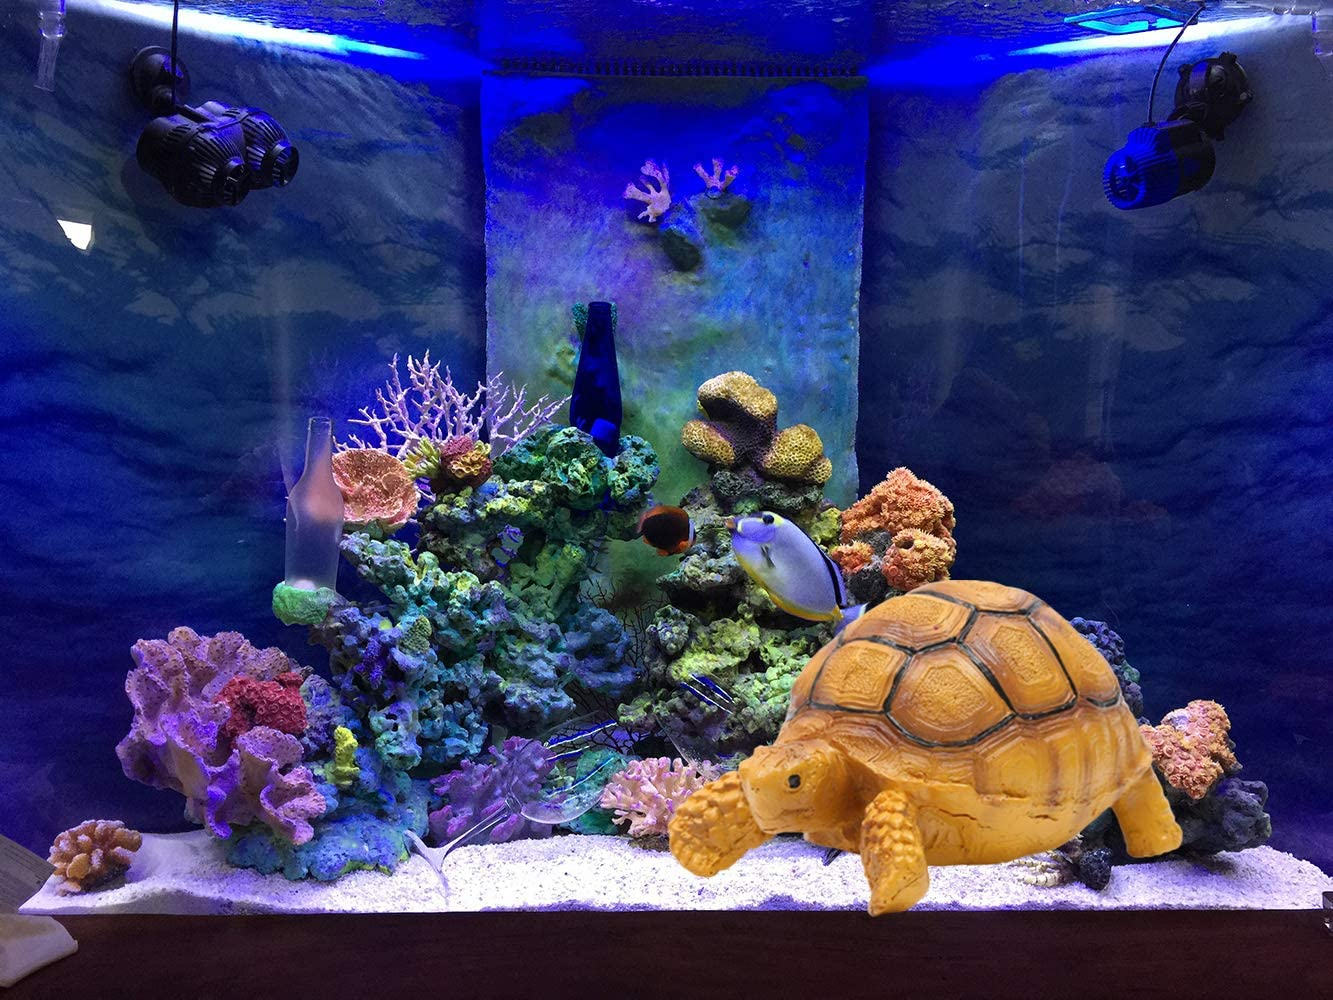 Generic Brands Fish Tank Aquarium Ornament Resin Tortoise Landscape Reptile Refuge House Small Pet Hidden Room Decoration